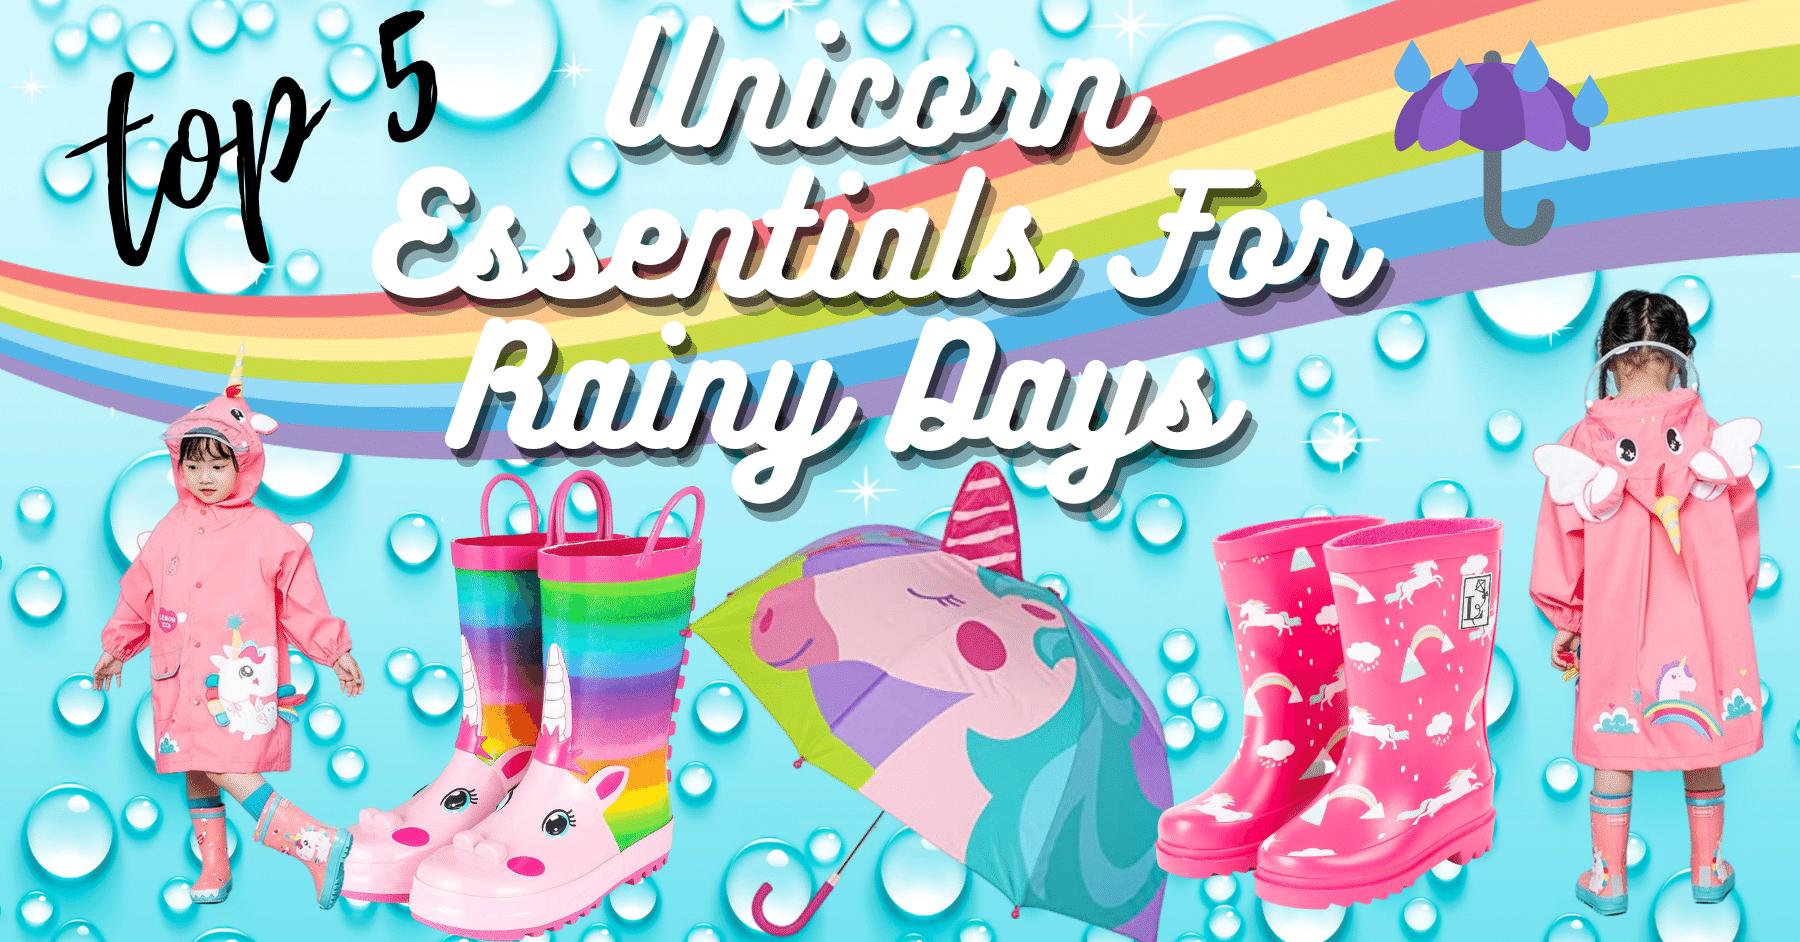 Top 5 Unicorn Essential Items For Rainy Days